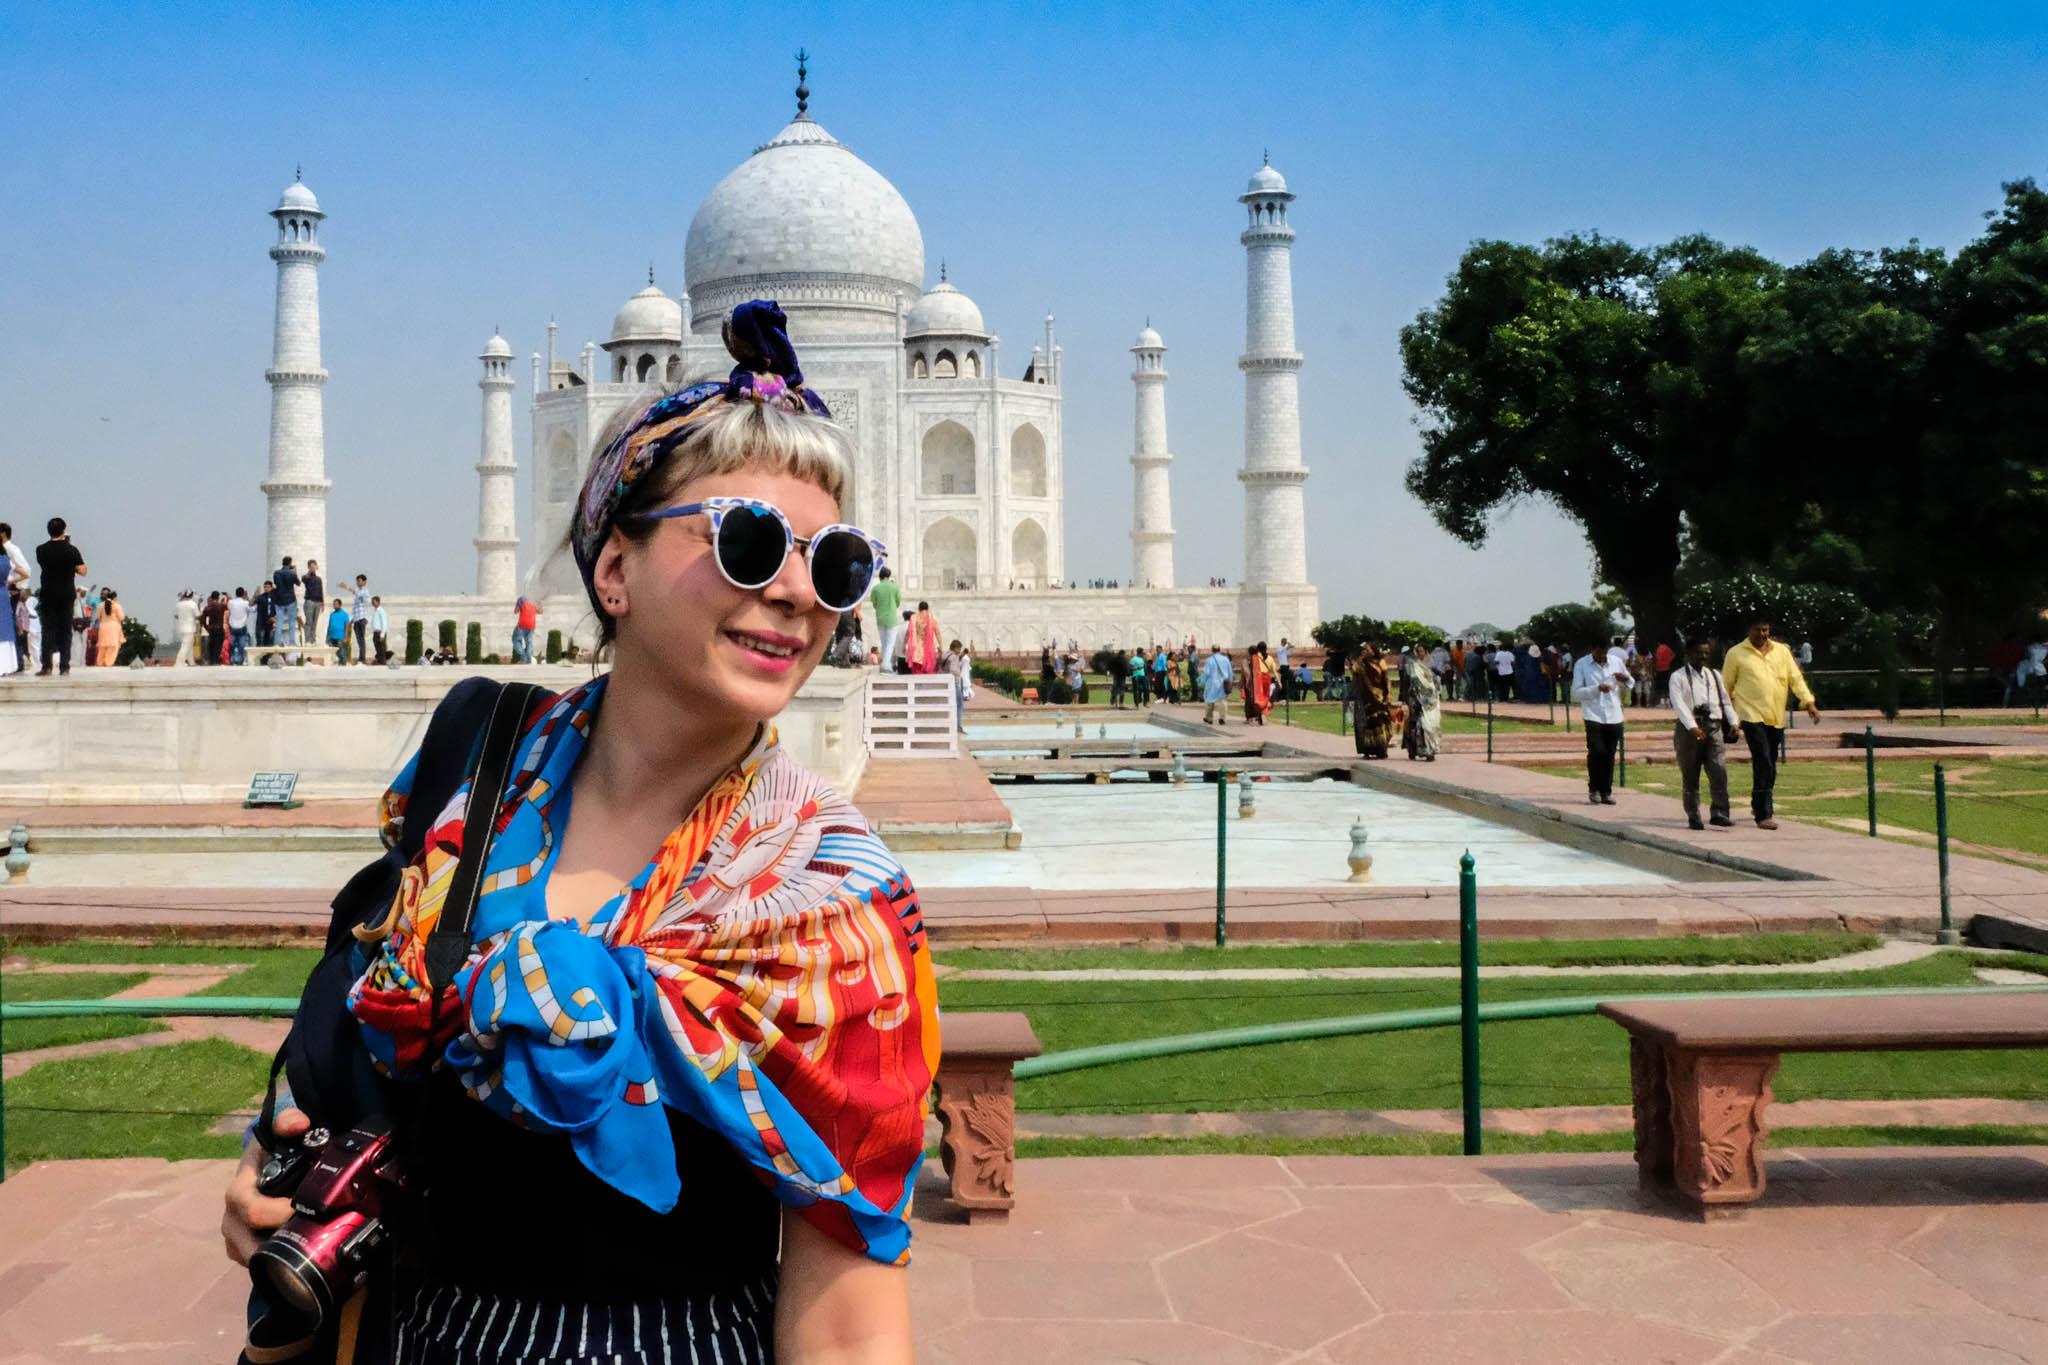 Capture travel memories with TraveLibro